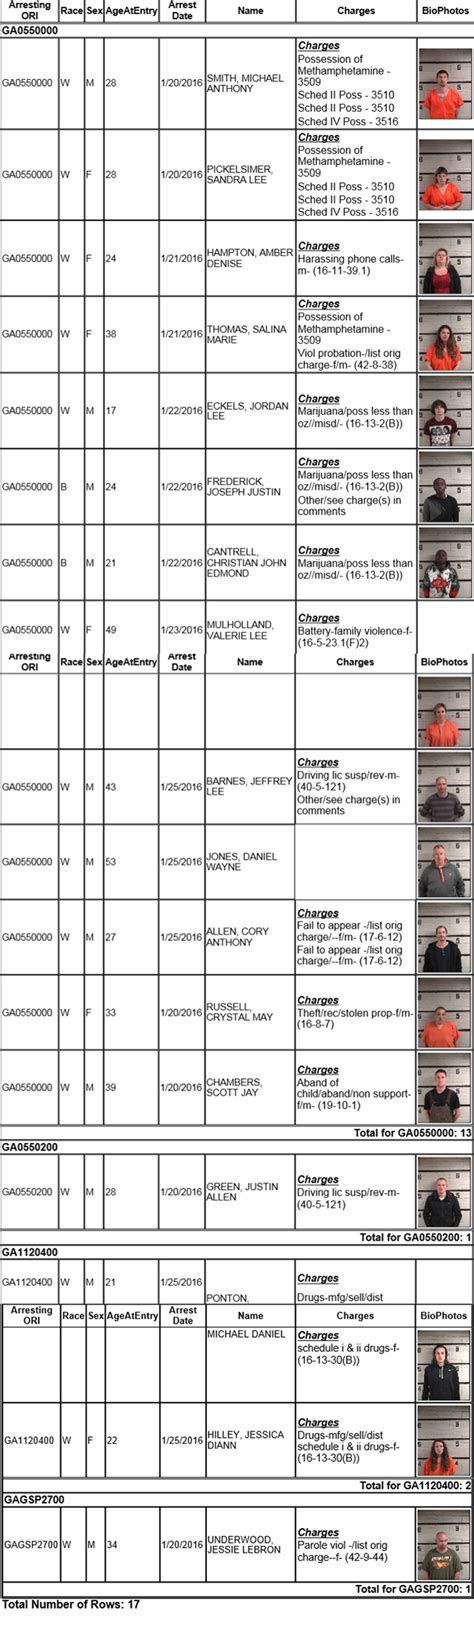 Fannin County Records Fannin County Sheriff S Office Arrest Report 1 20 To 1 25 Myinforms